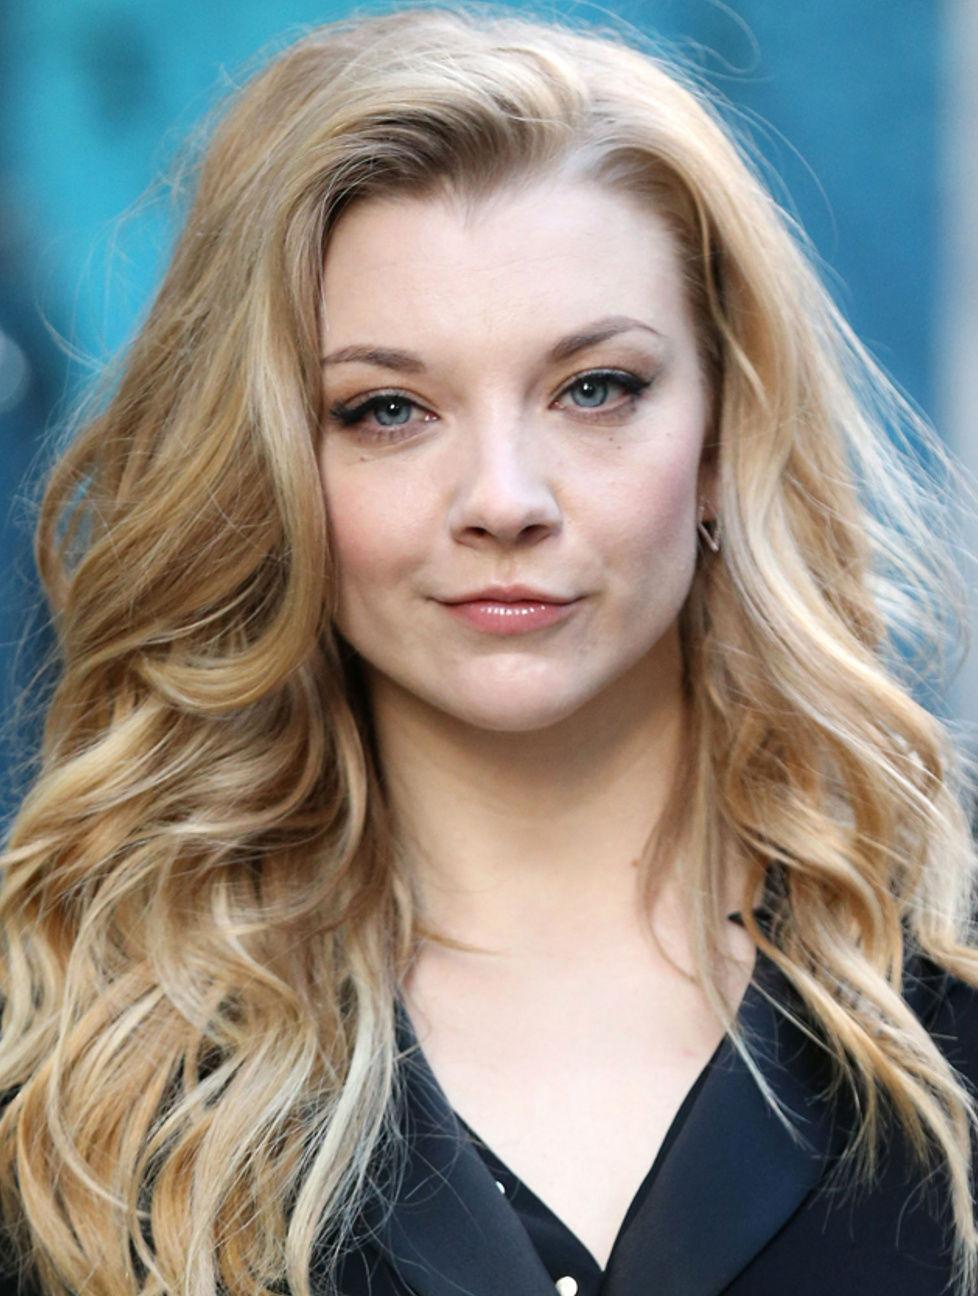 Photo of Natalie Dormer: English actress